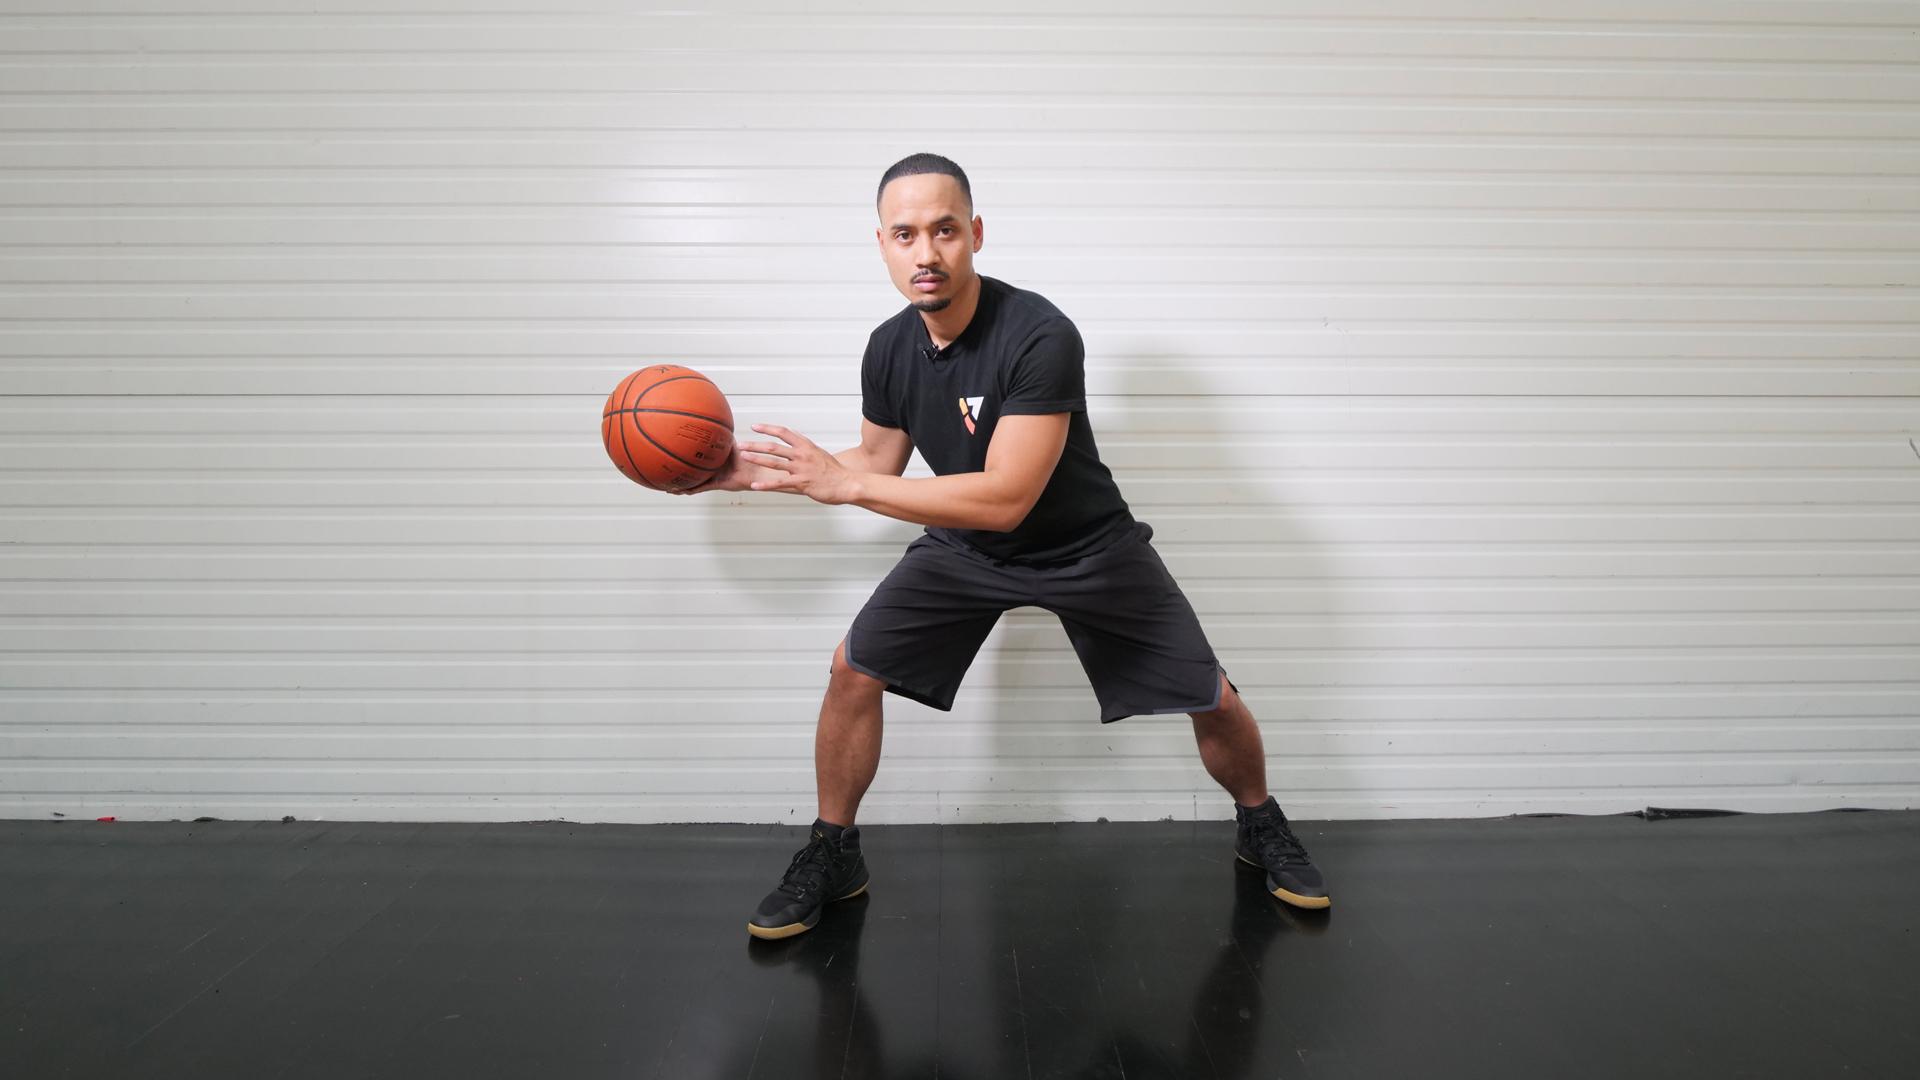 Entraîne-toi avec Better Athlete Basketball post thumbnail